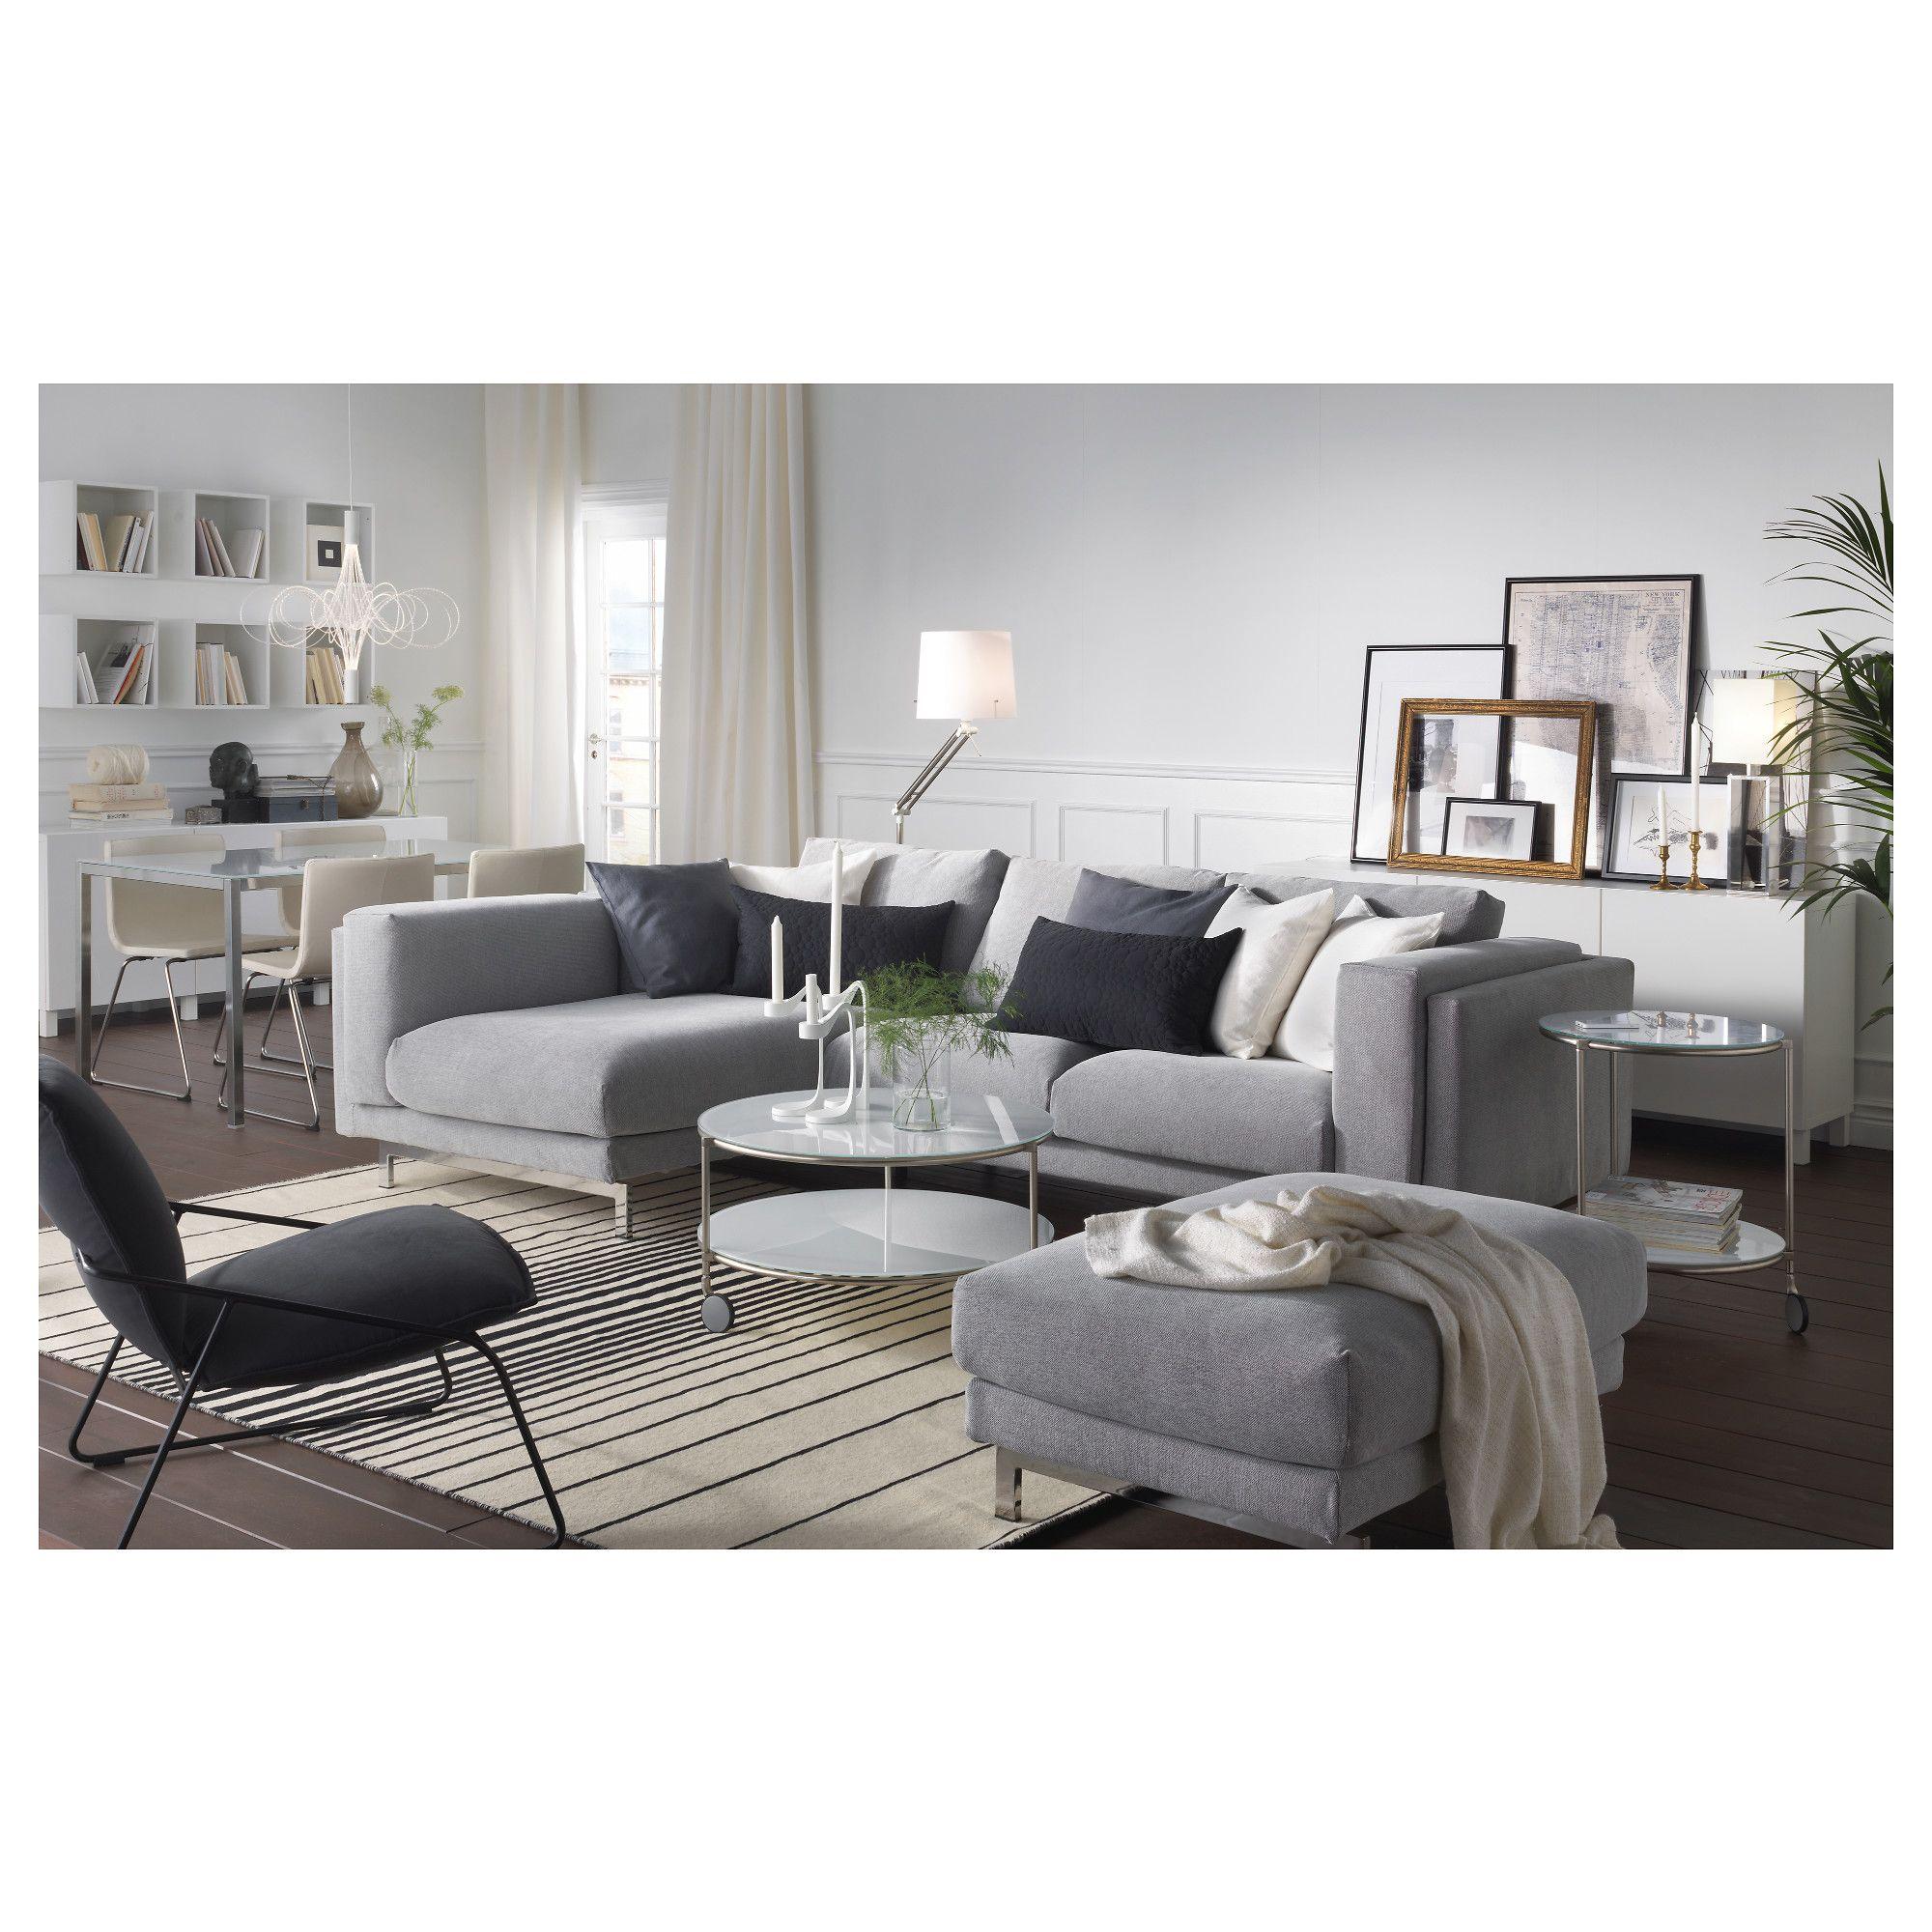 NOCKEBY 3 Seat Sofa With Chaise Longue Left Tallmyra White Black